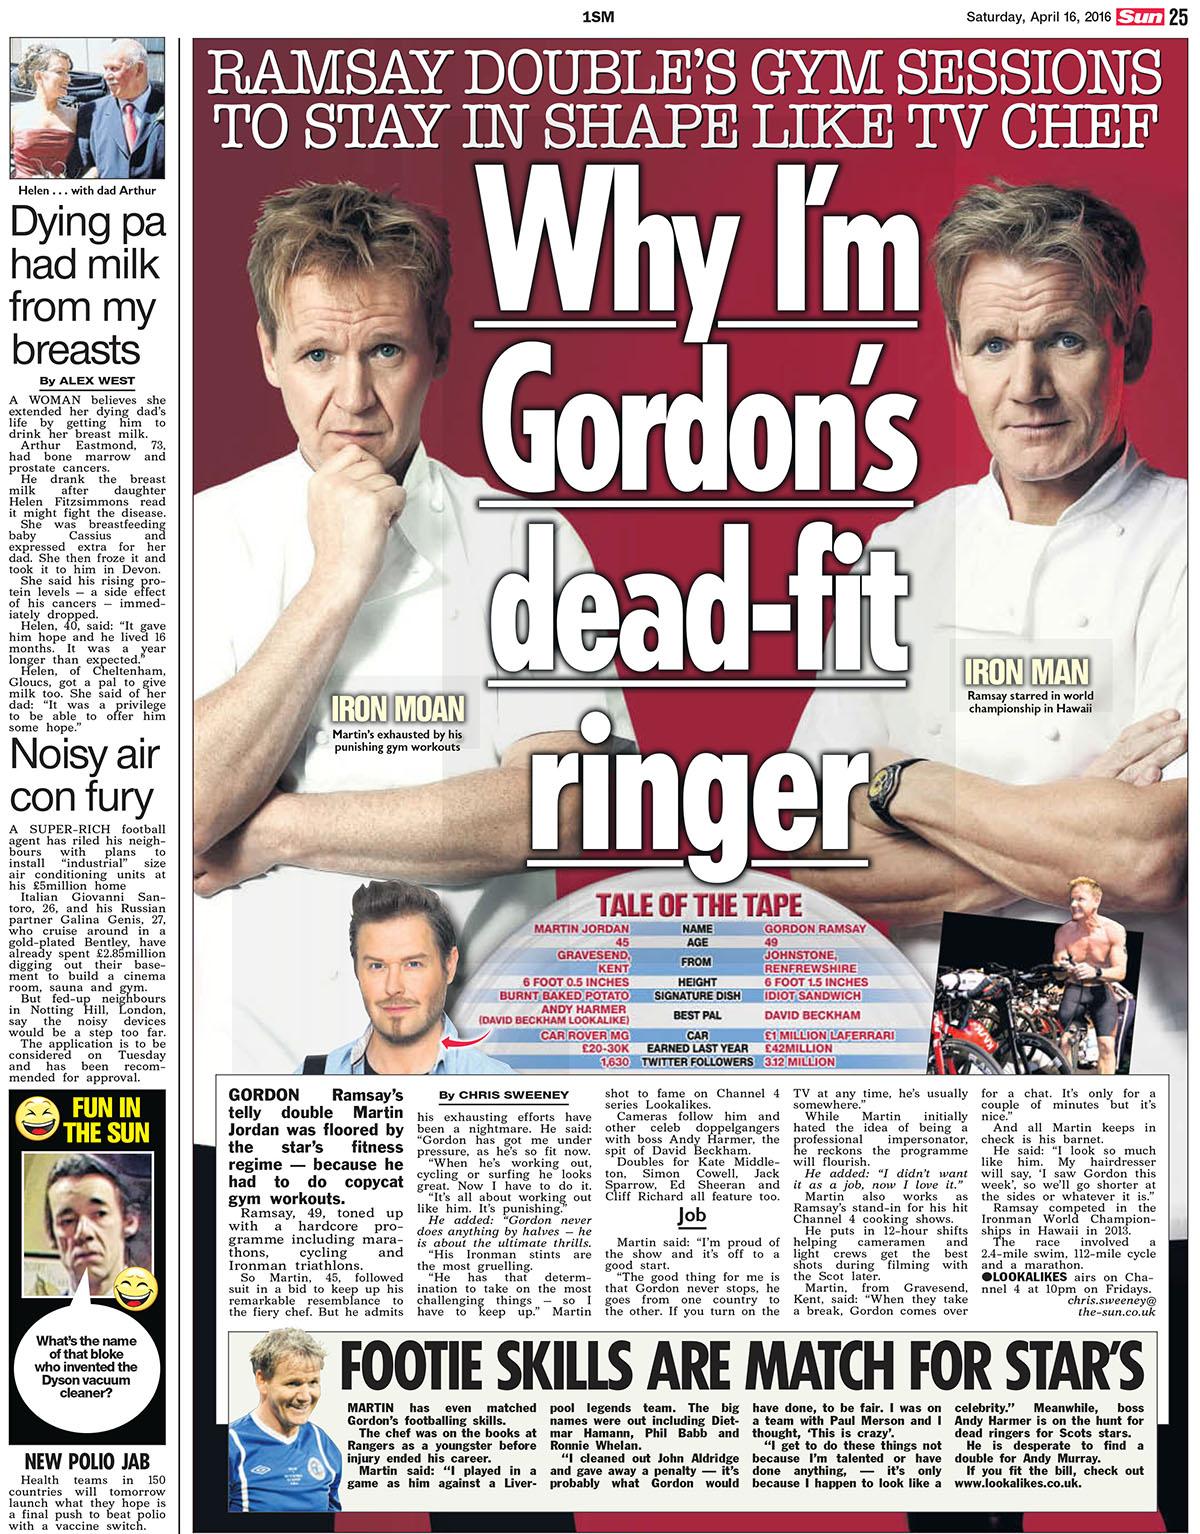 Gordon Ramsay lookalike fitness battle